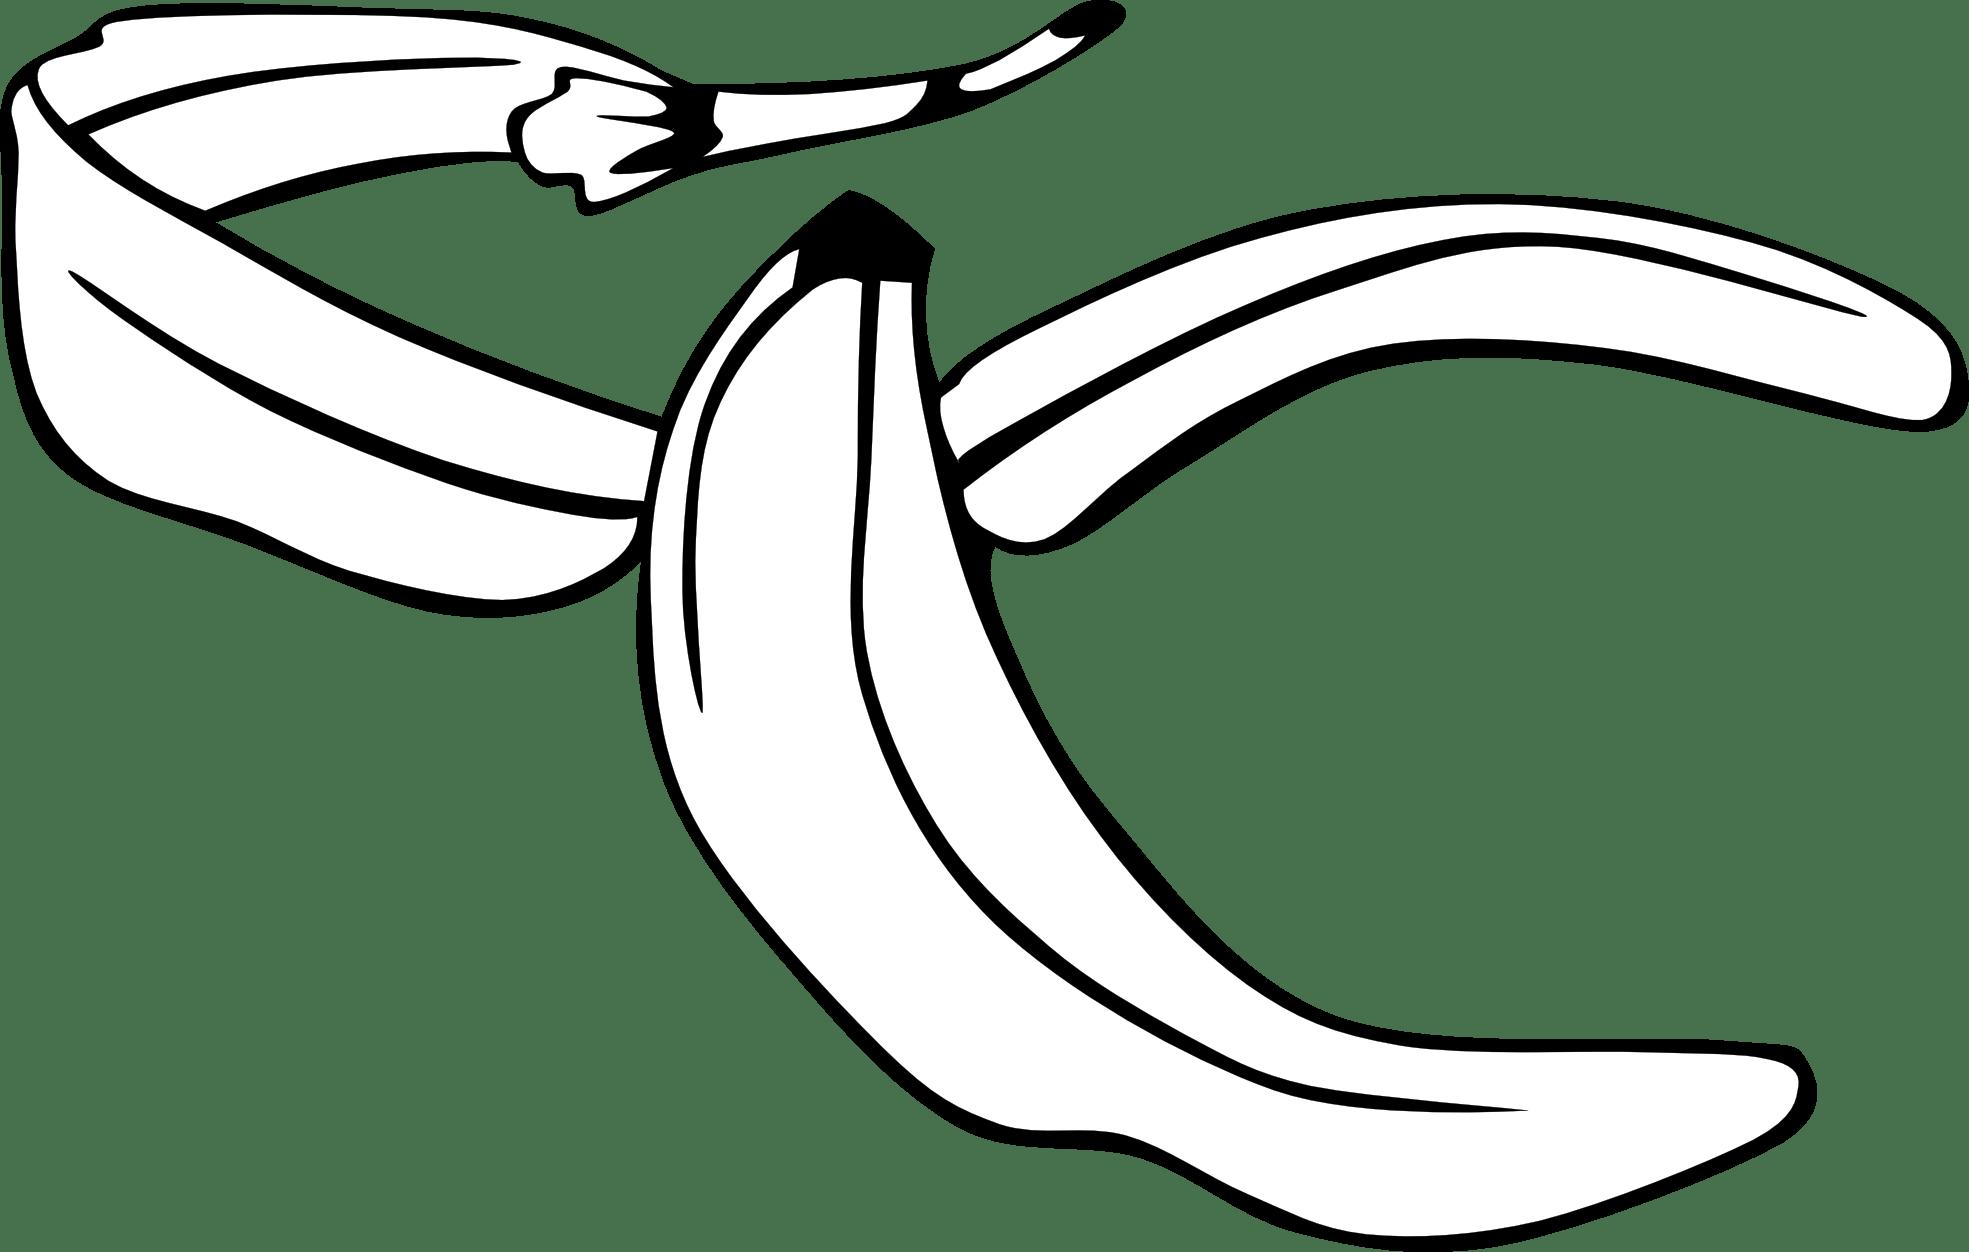 Banana Clipart Black And White Clipart Panda